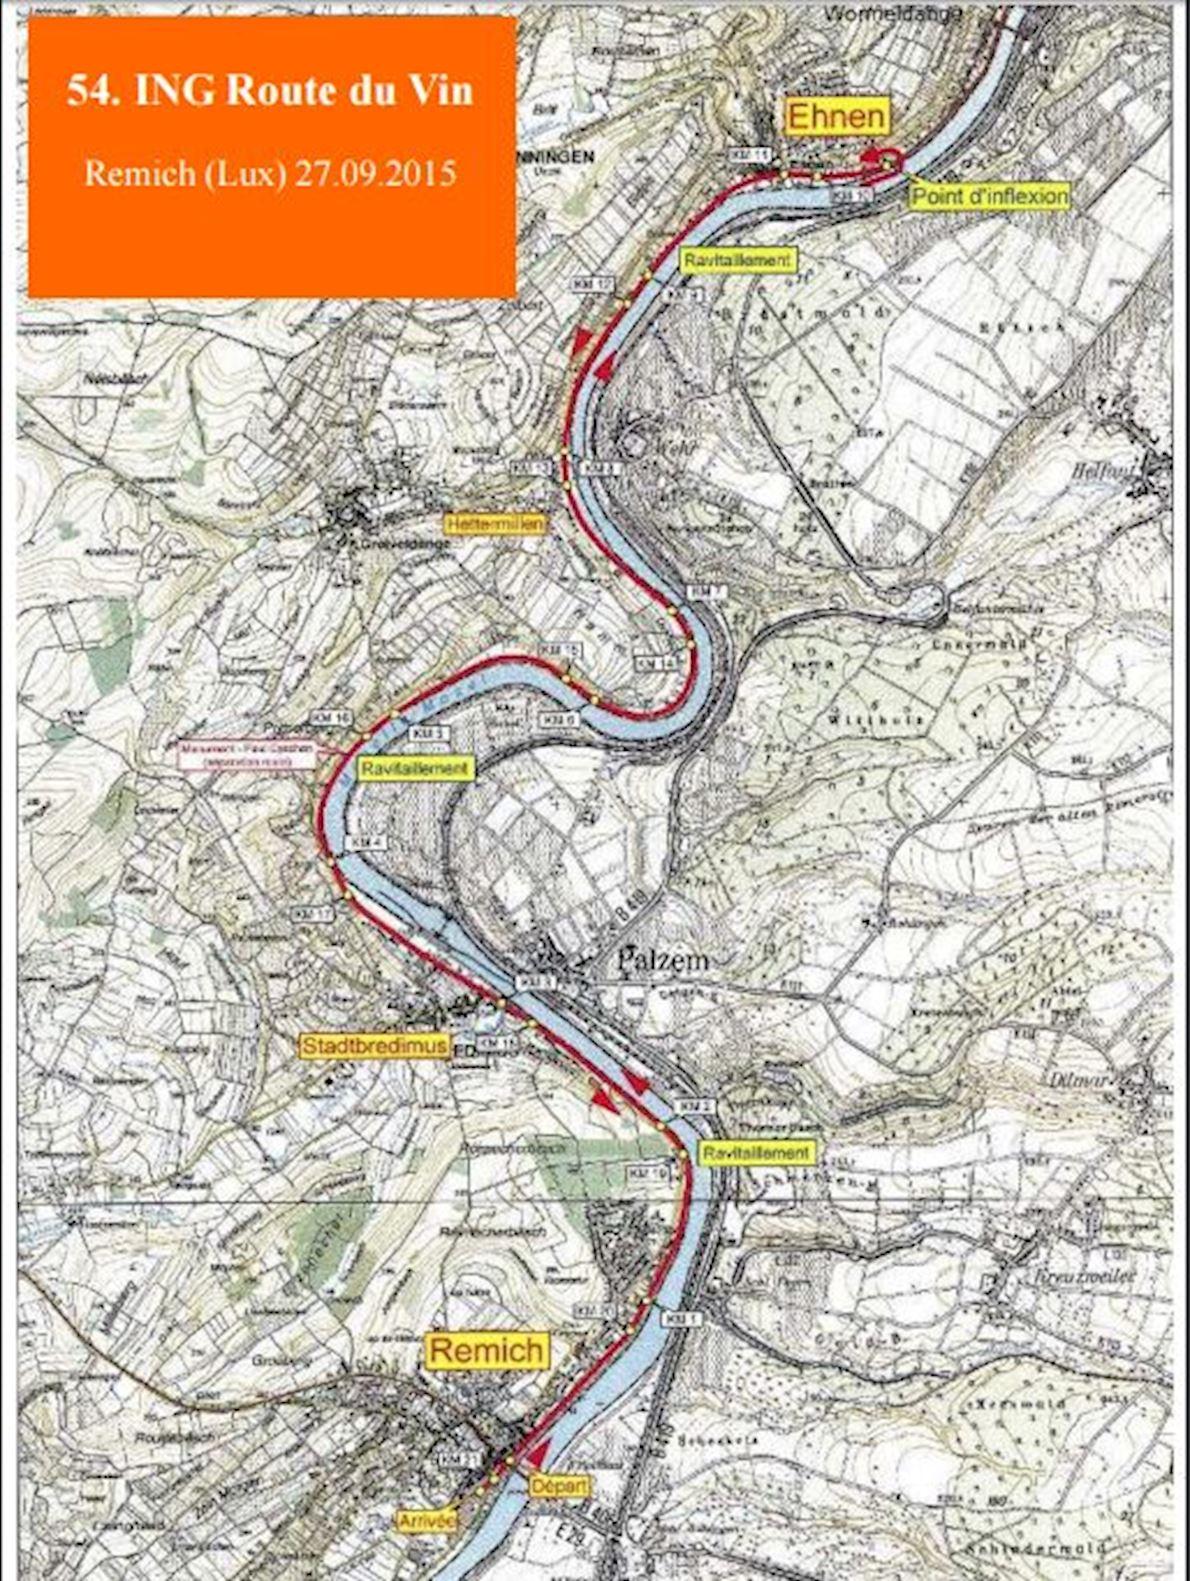 ING Route du Vin Half Marathon Mappa del percorso